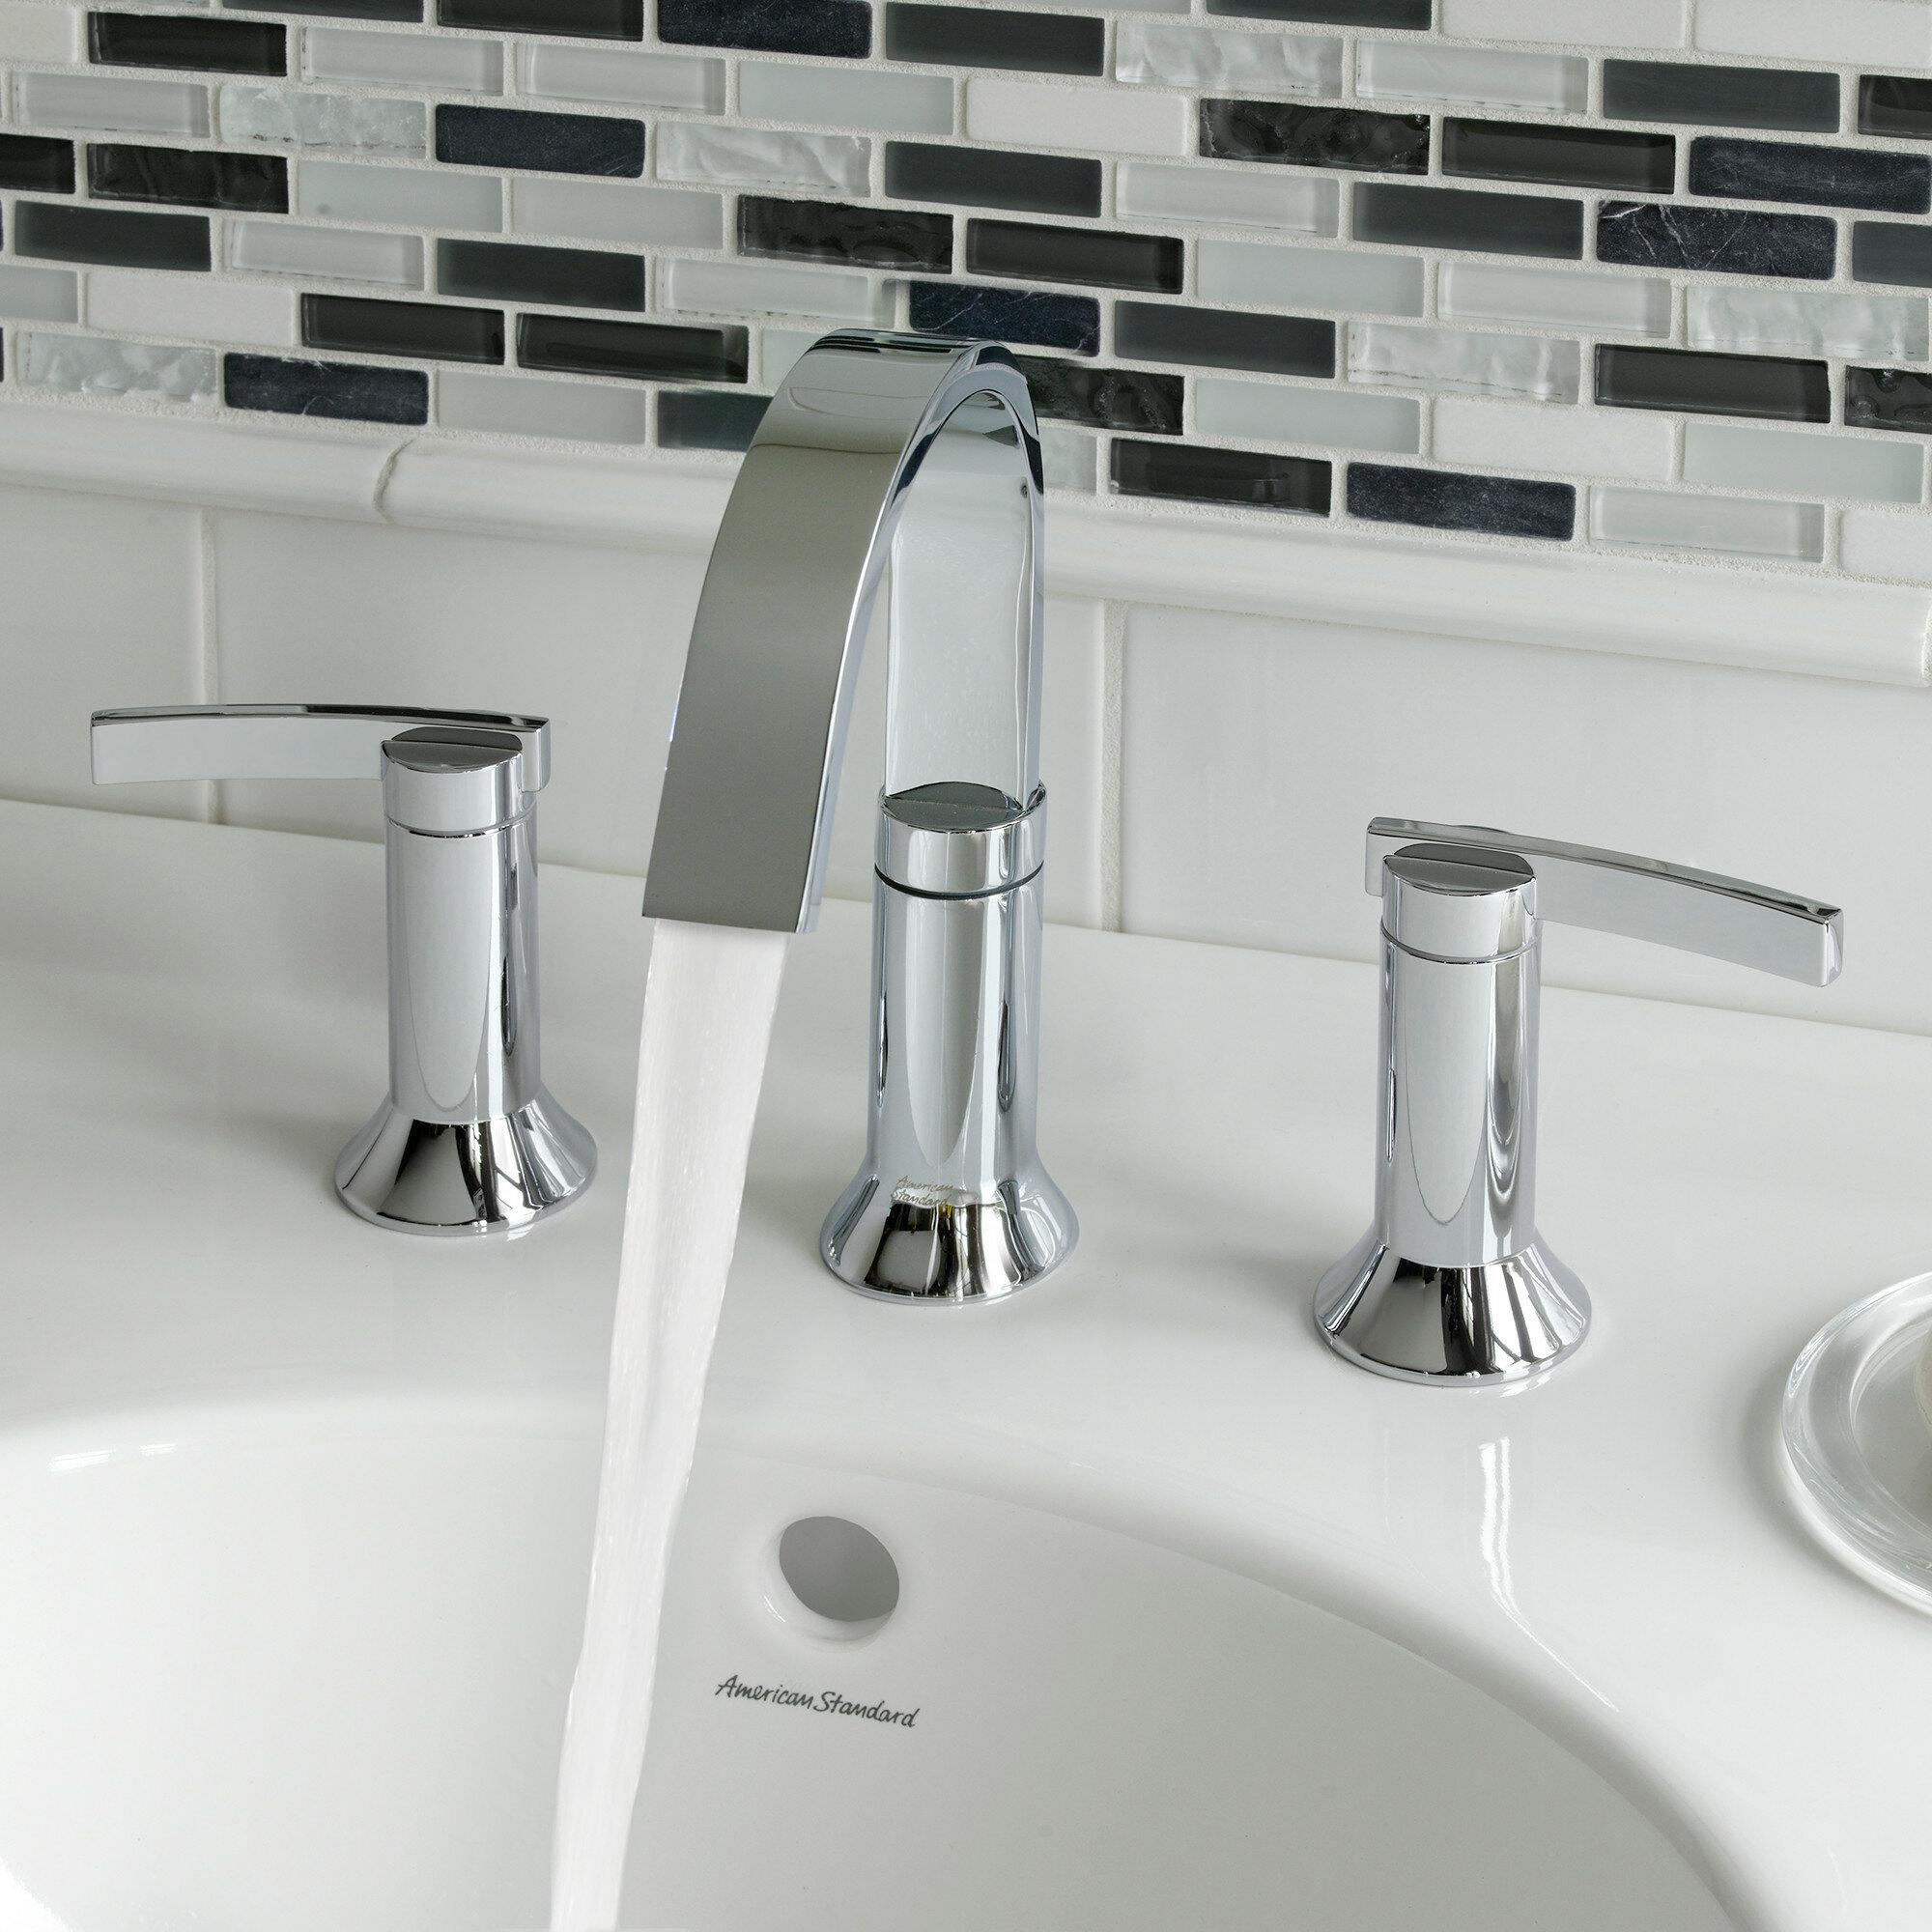 American Standard Berwick High Arc Widespread Bathroom Faucet with ...